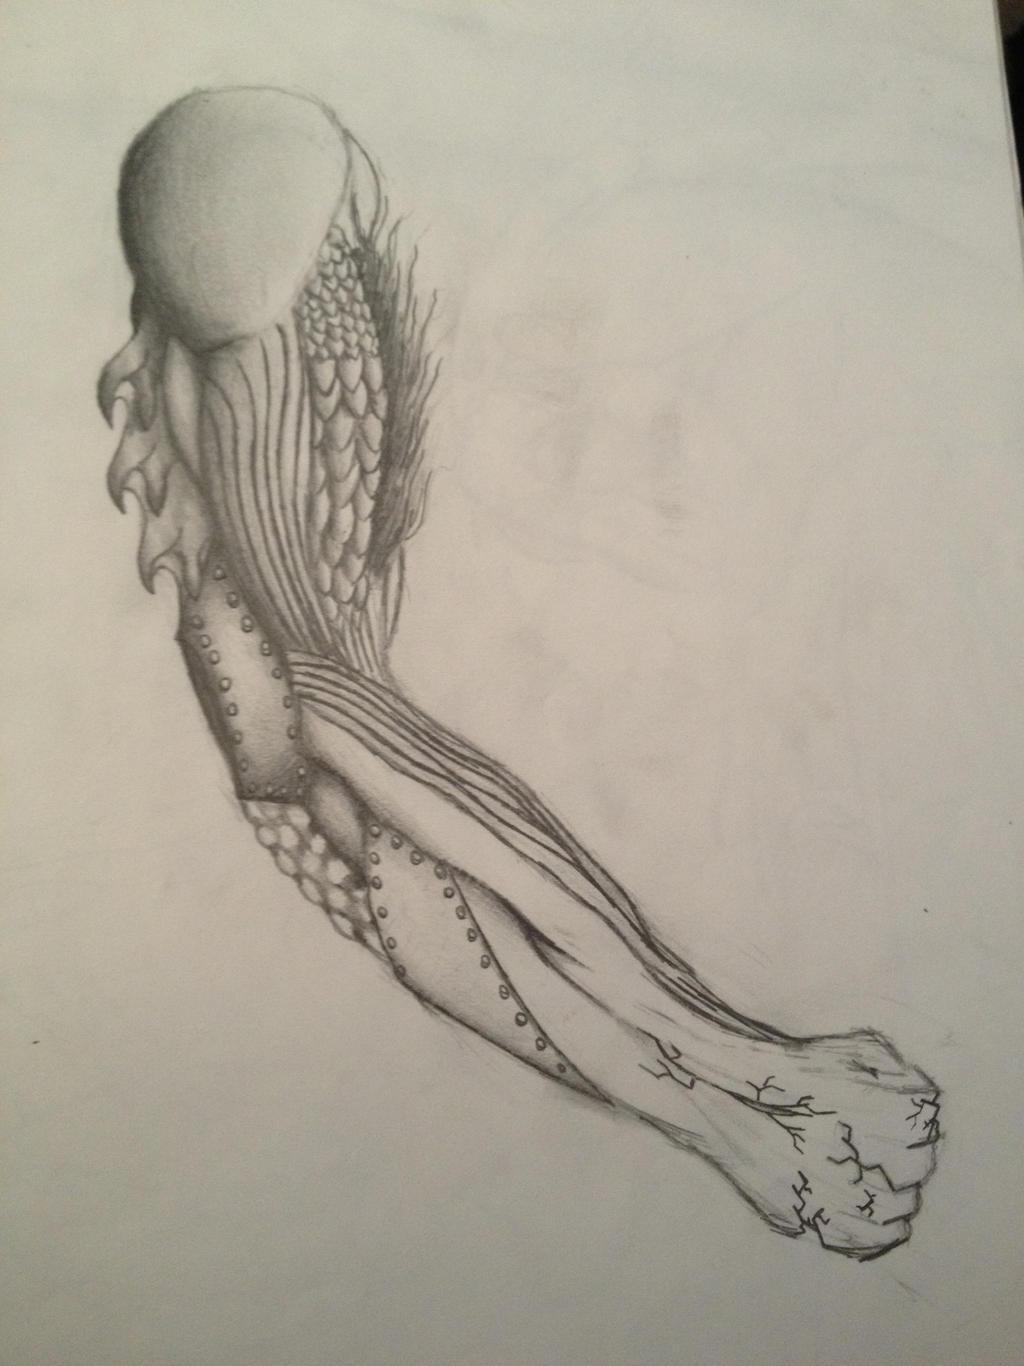 Elemental Arm by Rift-Mark